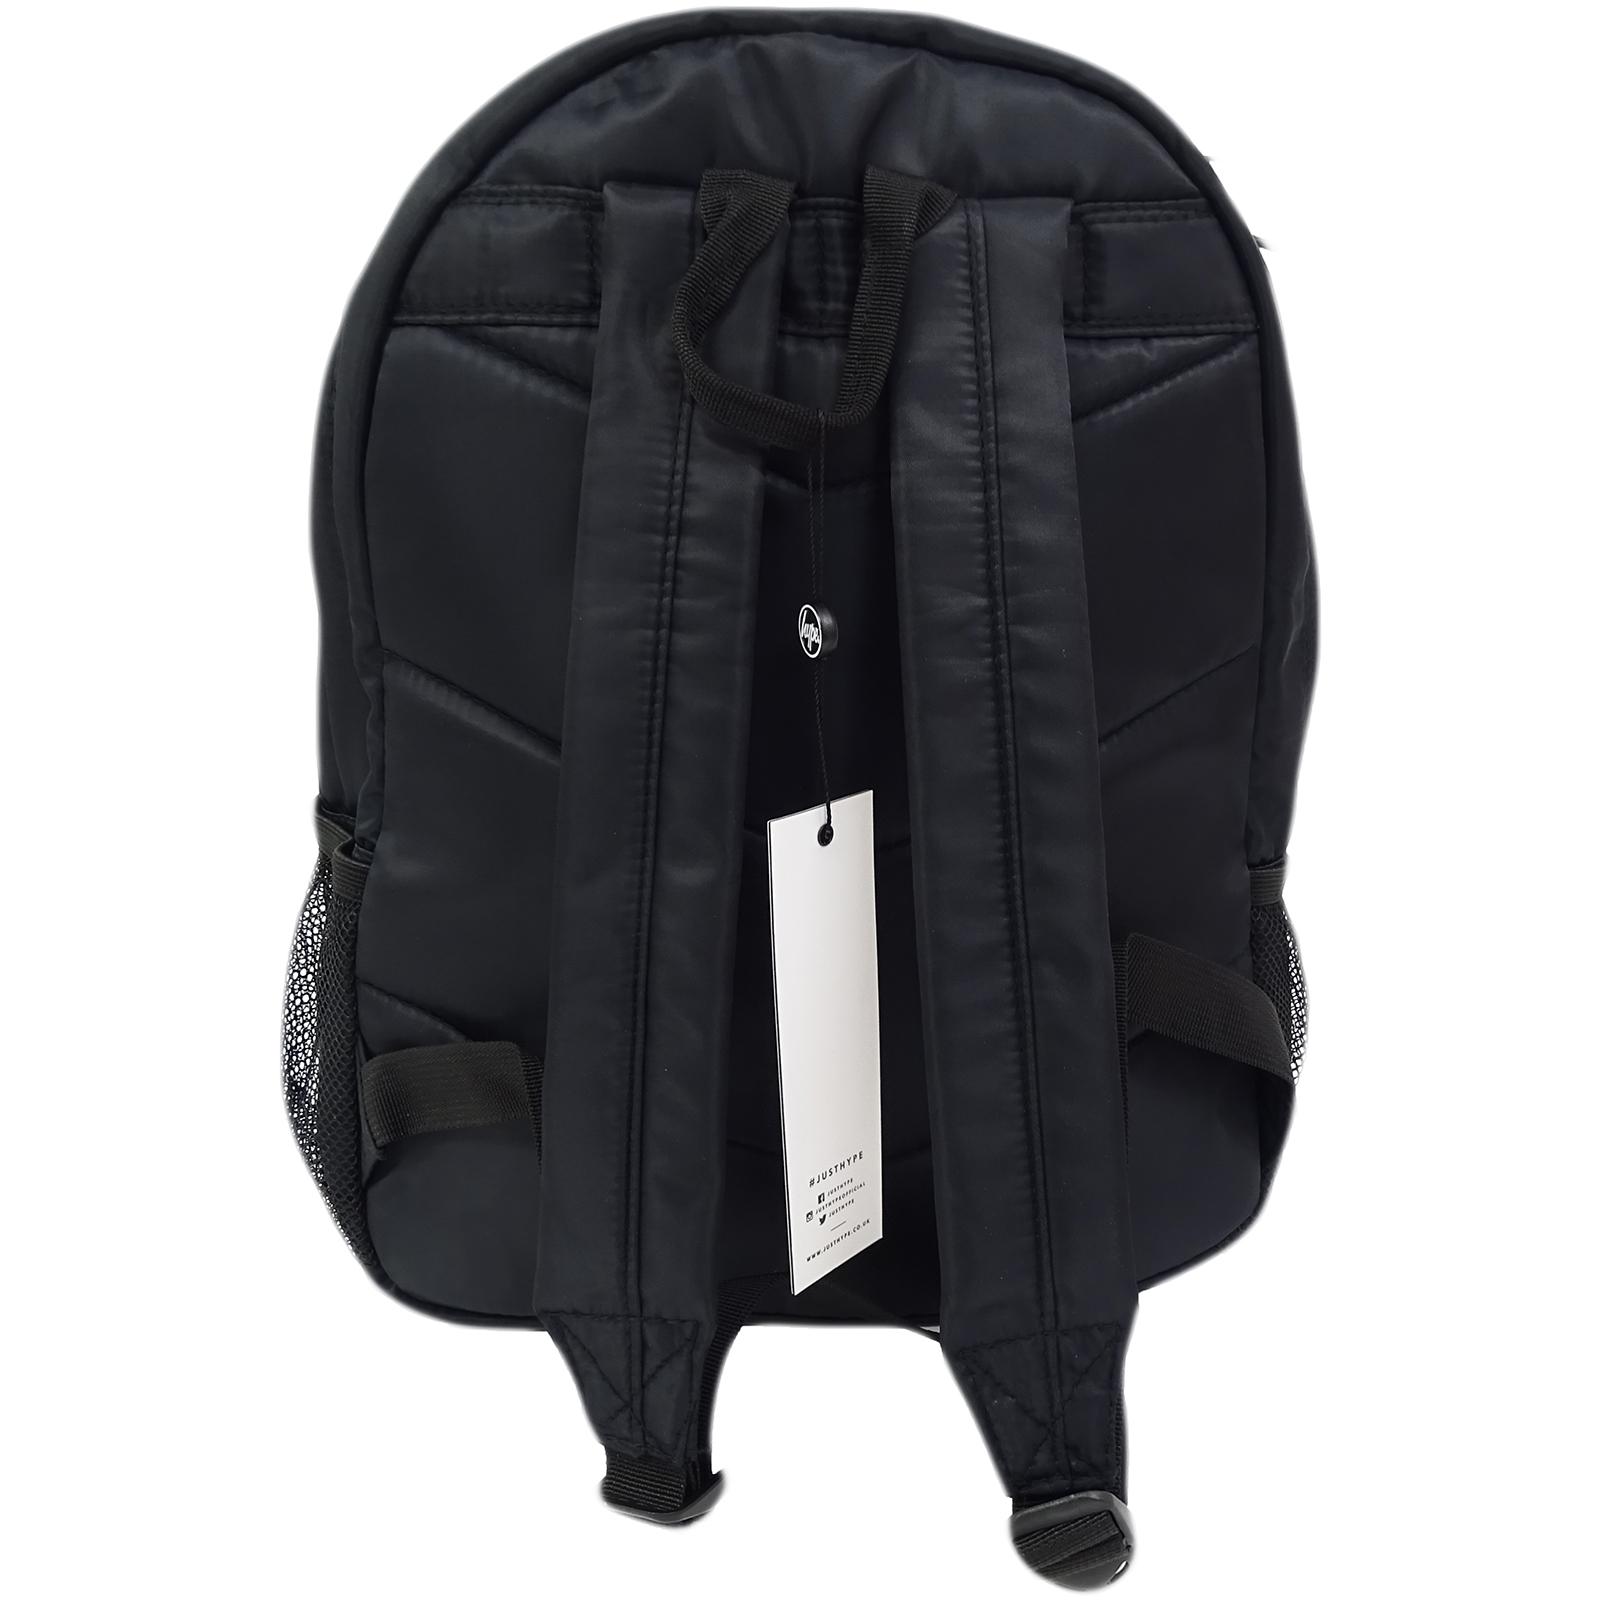 Unisexe-Hype-Sac-A-Dos-Ecole-Gym-SACS-pochettes-pencil-case miniature 83